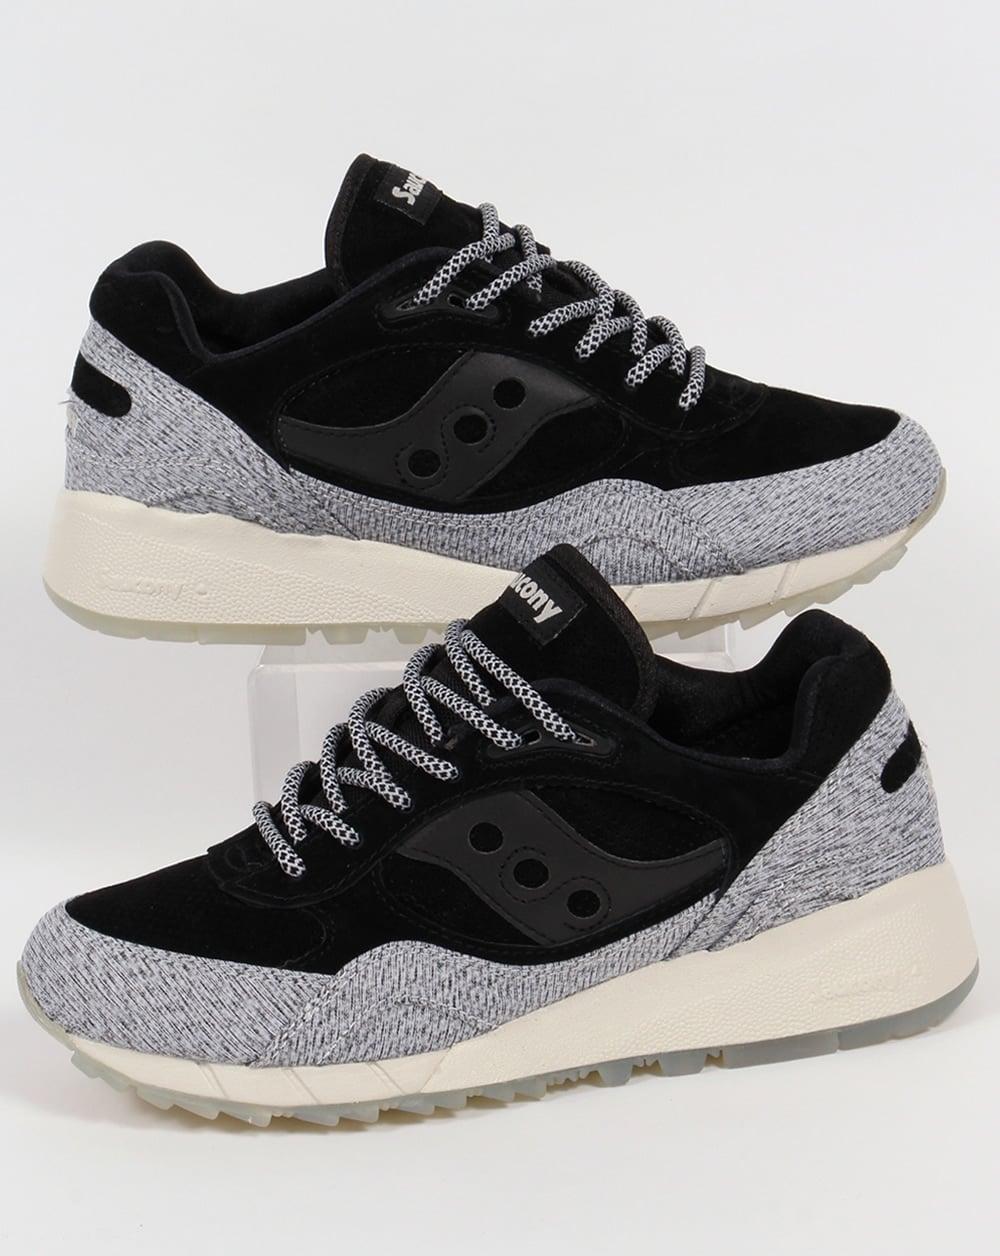 b31d94a12cbb Saucony Saucony Shadow 6000 Dirty Snow II Trainers Grey Black